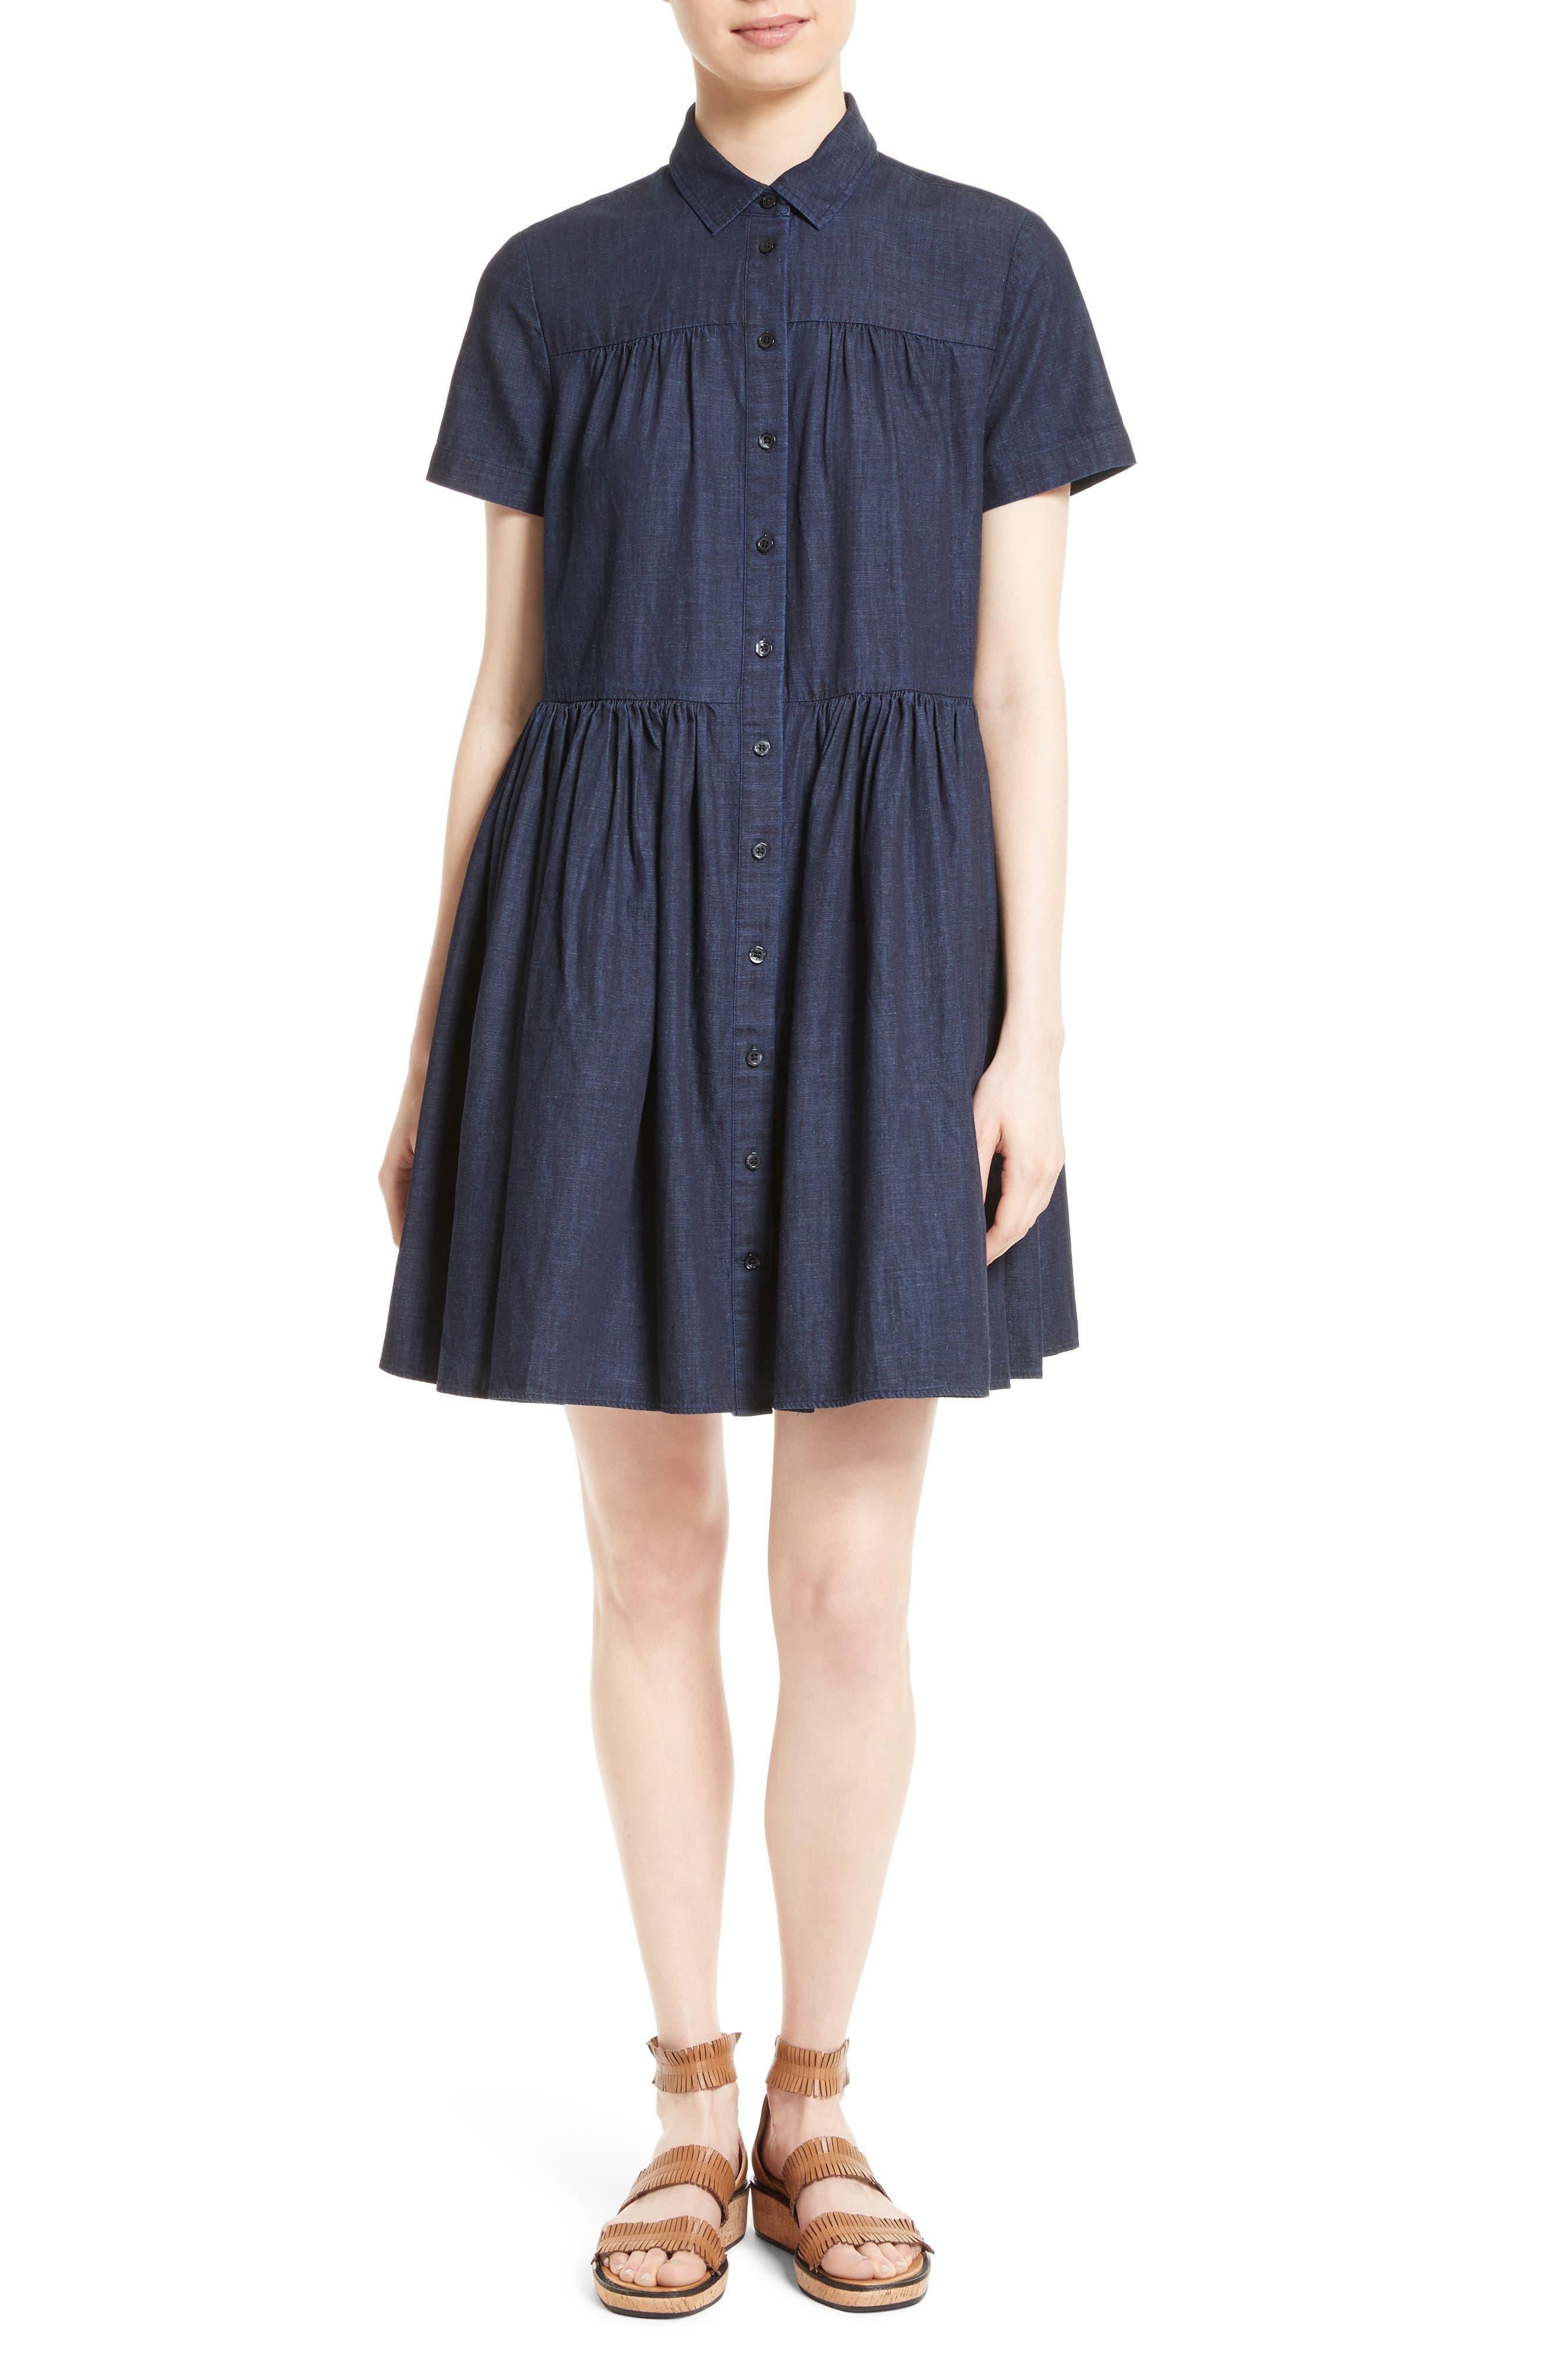 Alternate Image 1 Selected - kate spade new york chambray swing shirtdress